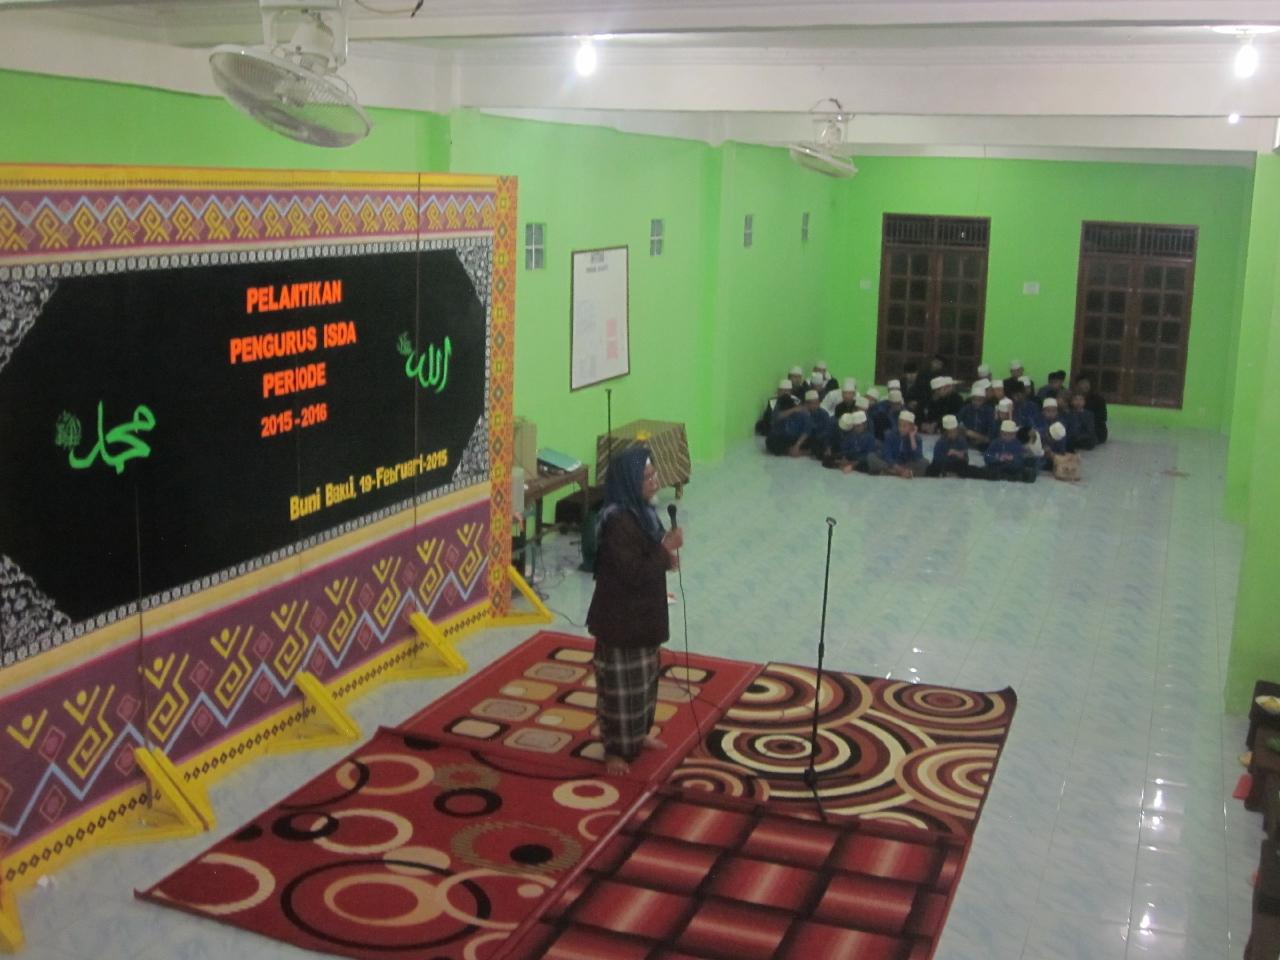 Pergantian Pengurus Ikatan Santri Darul 'Amal (ISDA) 2015-2016